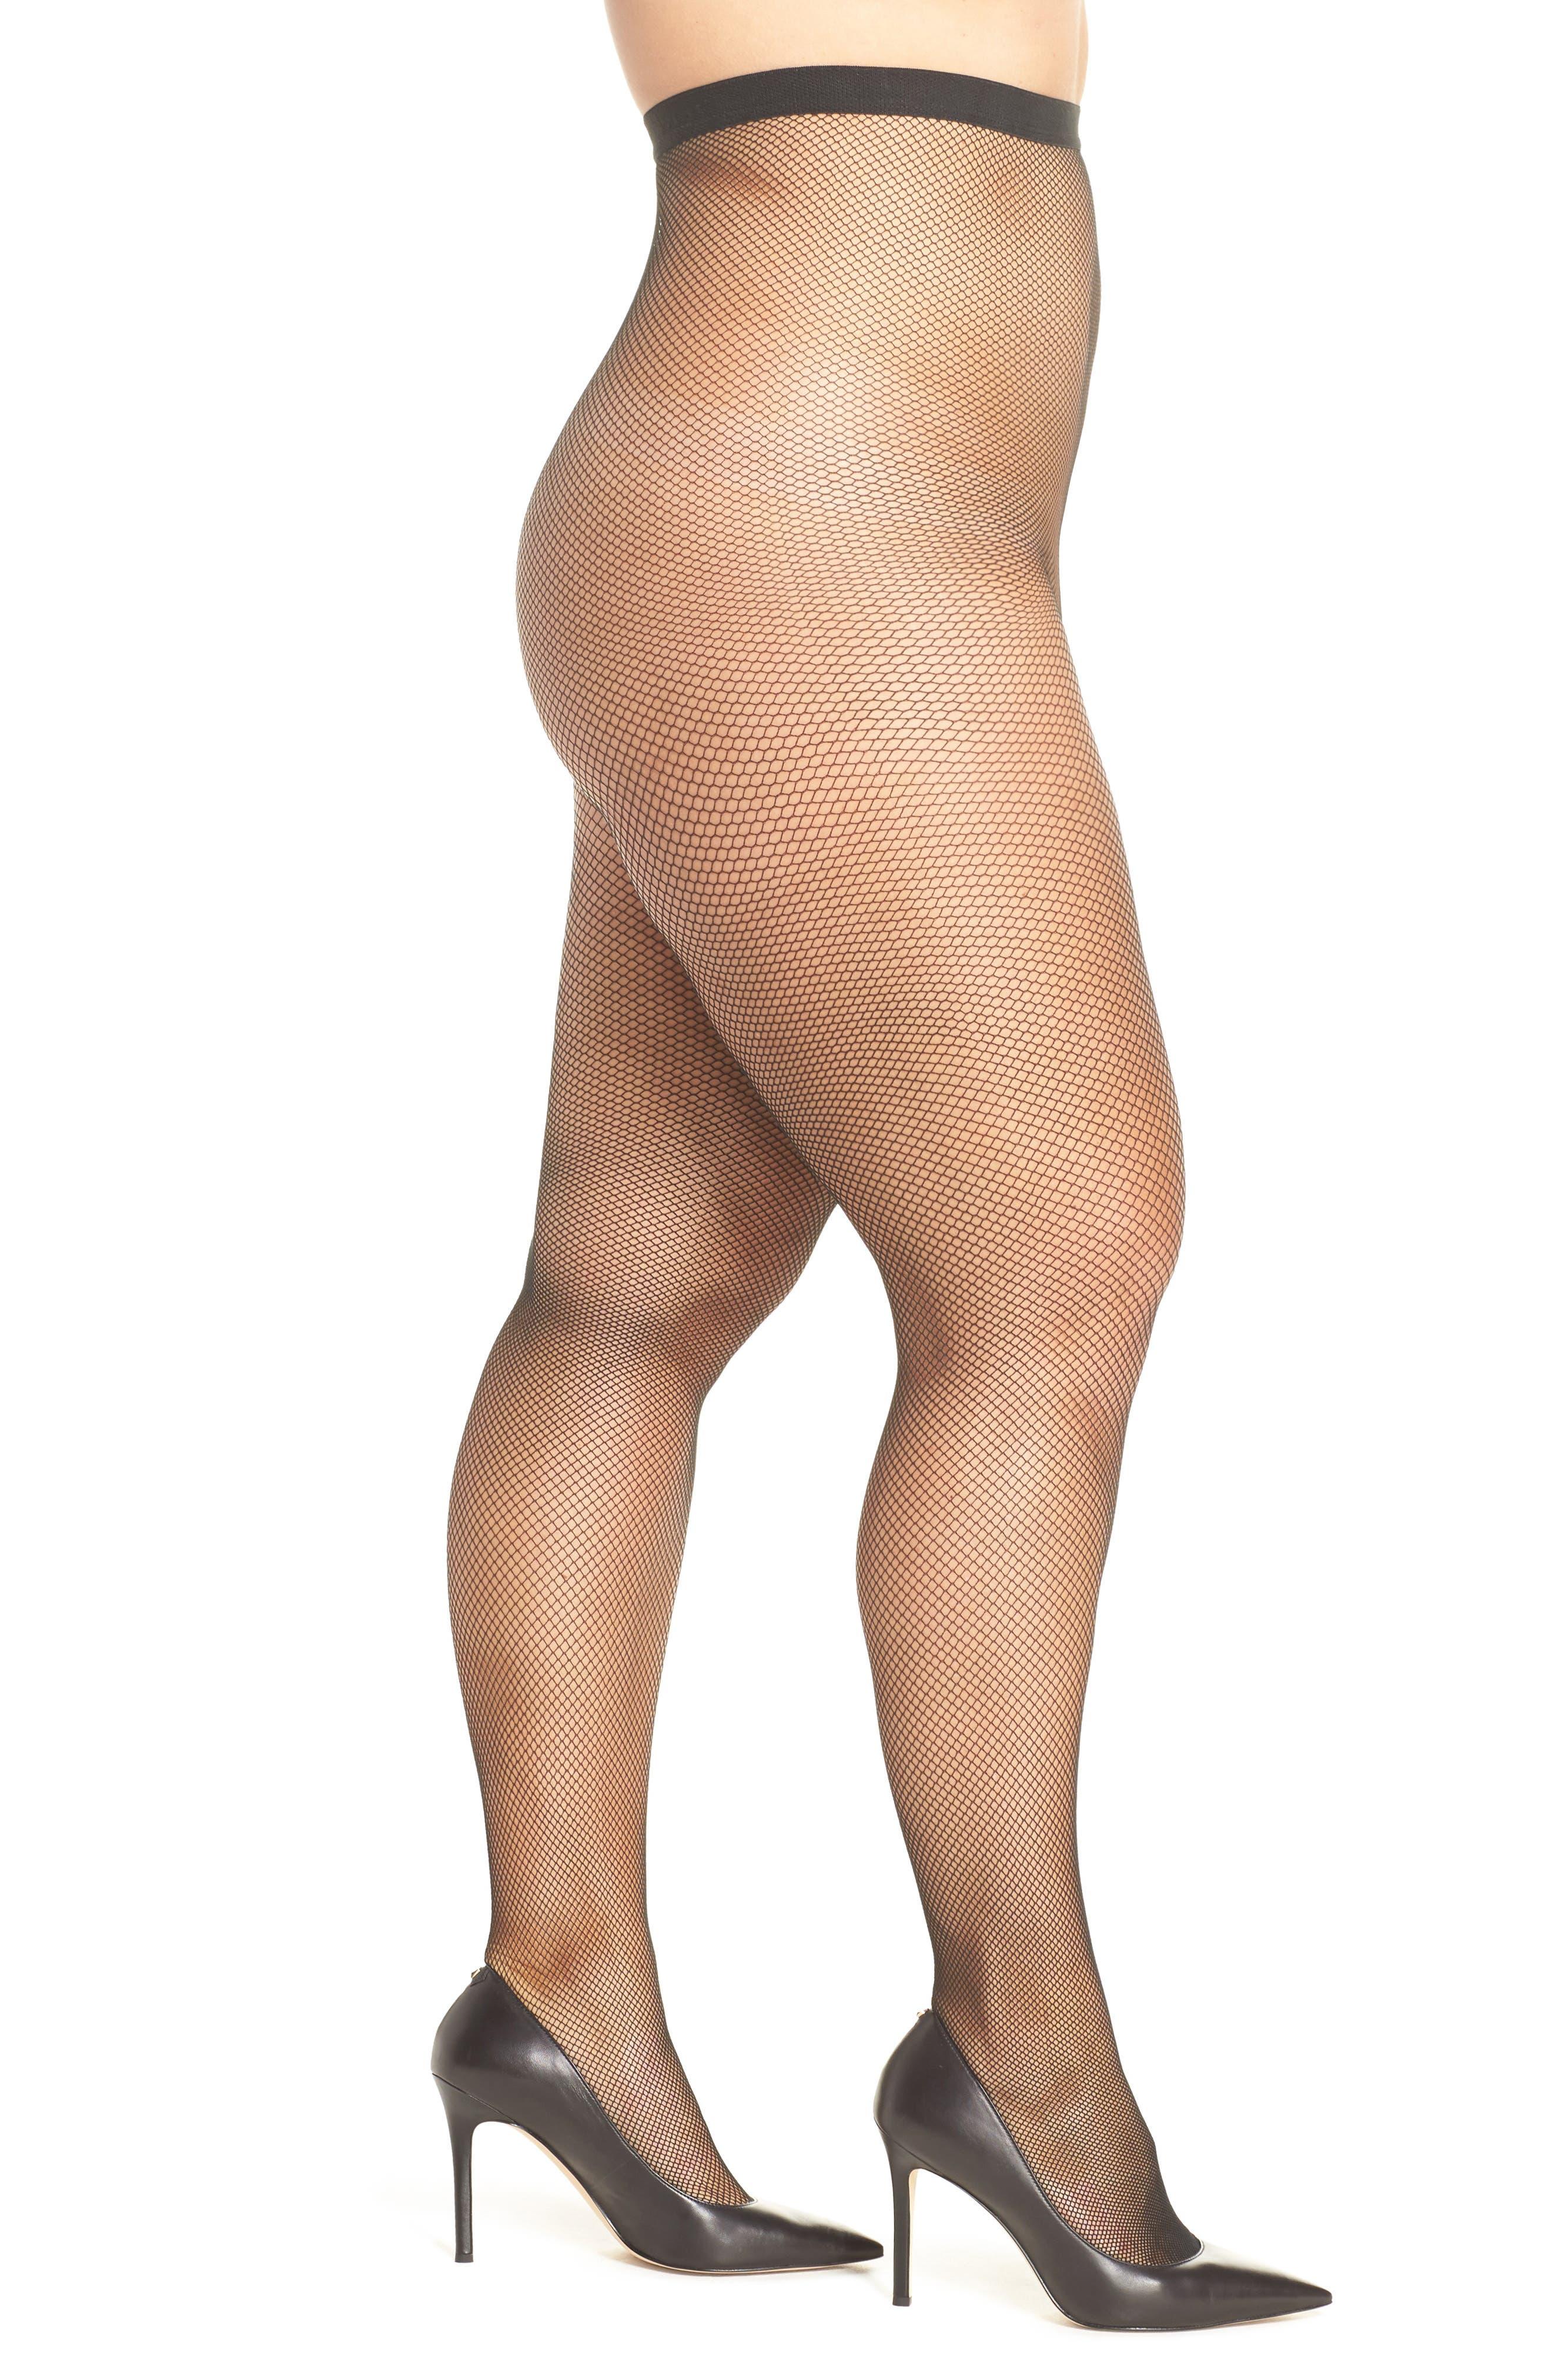 1920s Style Stockings, Tights, Fishnets & Socks Berkshire Fishnet Tights Size 3X4X - Black $11.00 AT vintagedancer.com